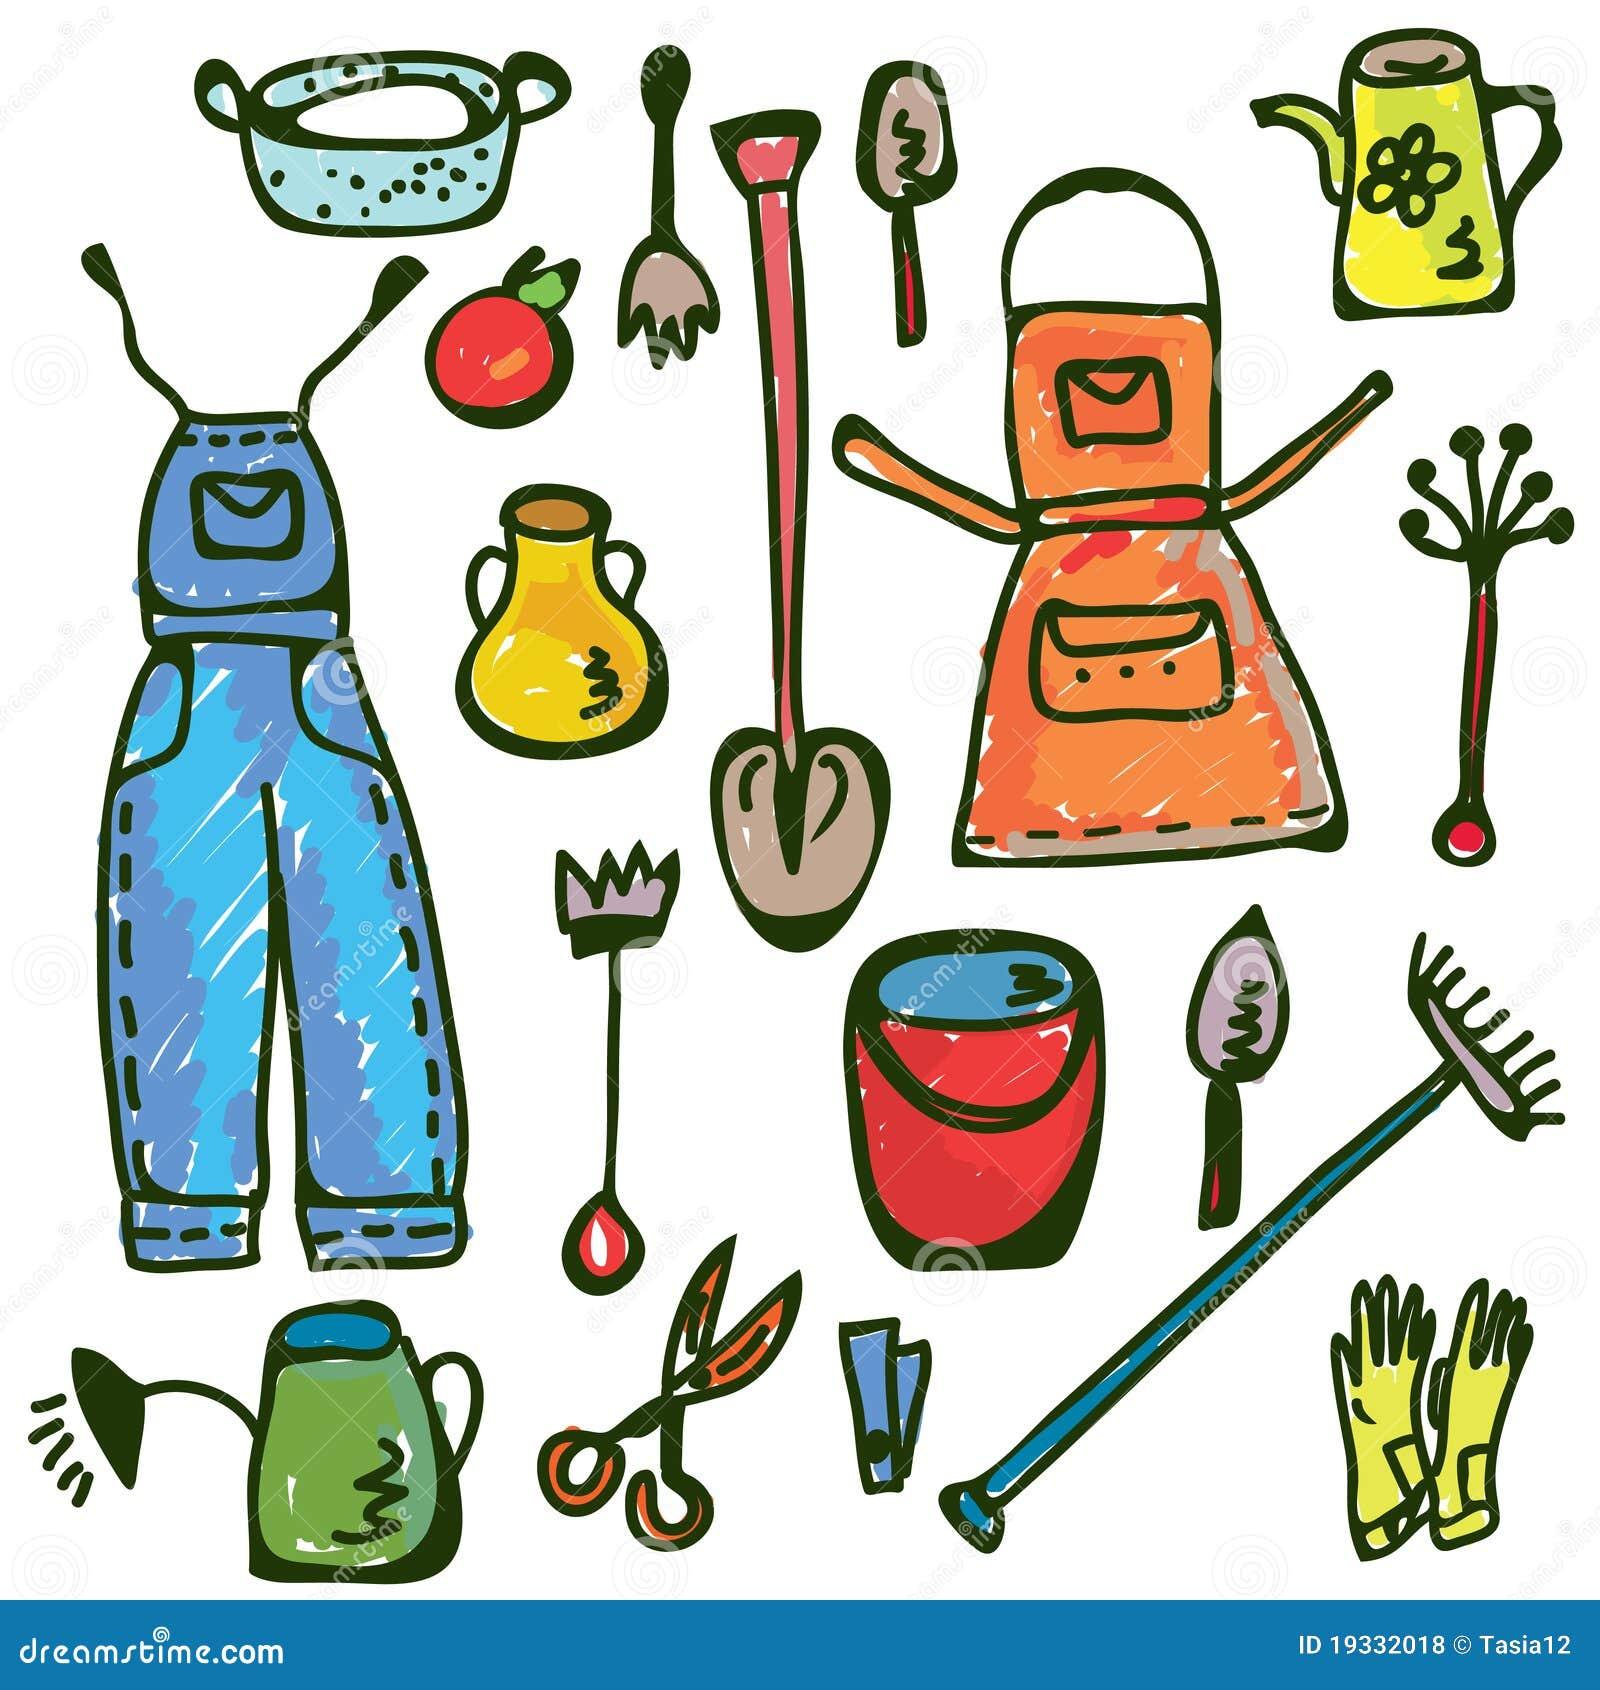 Gardening tools set funny doodle stock vector image for Garderoben set funny